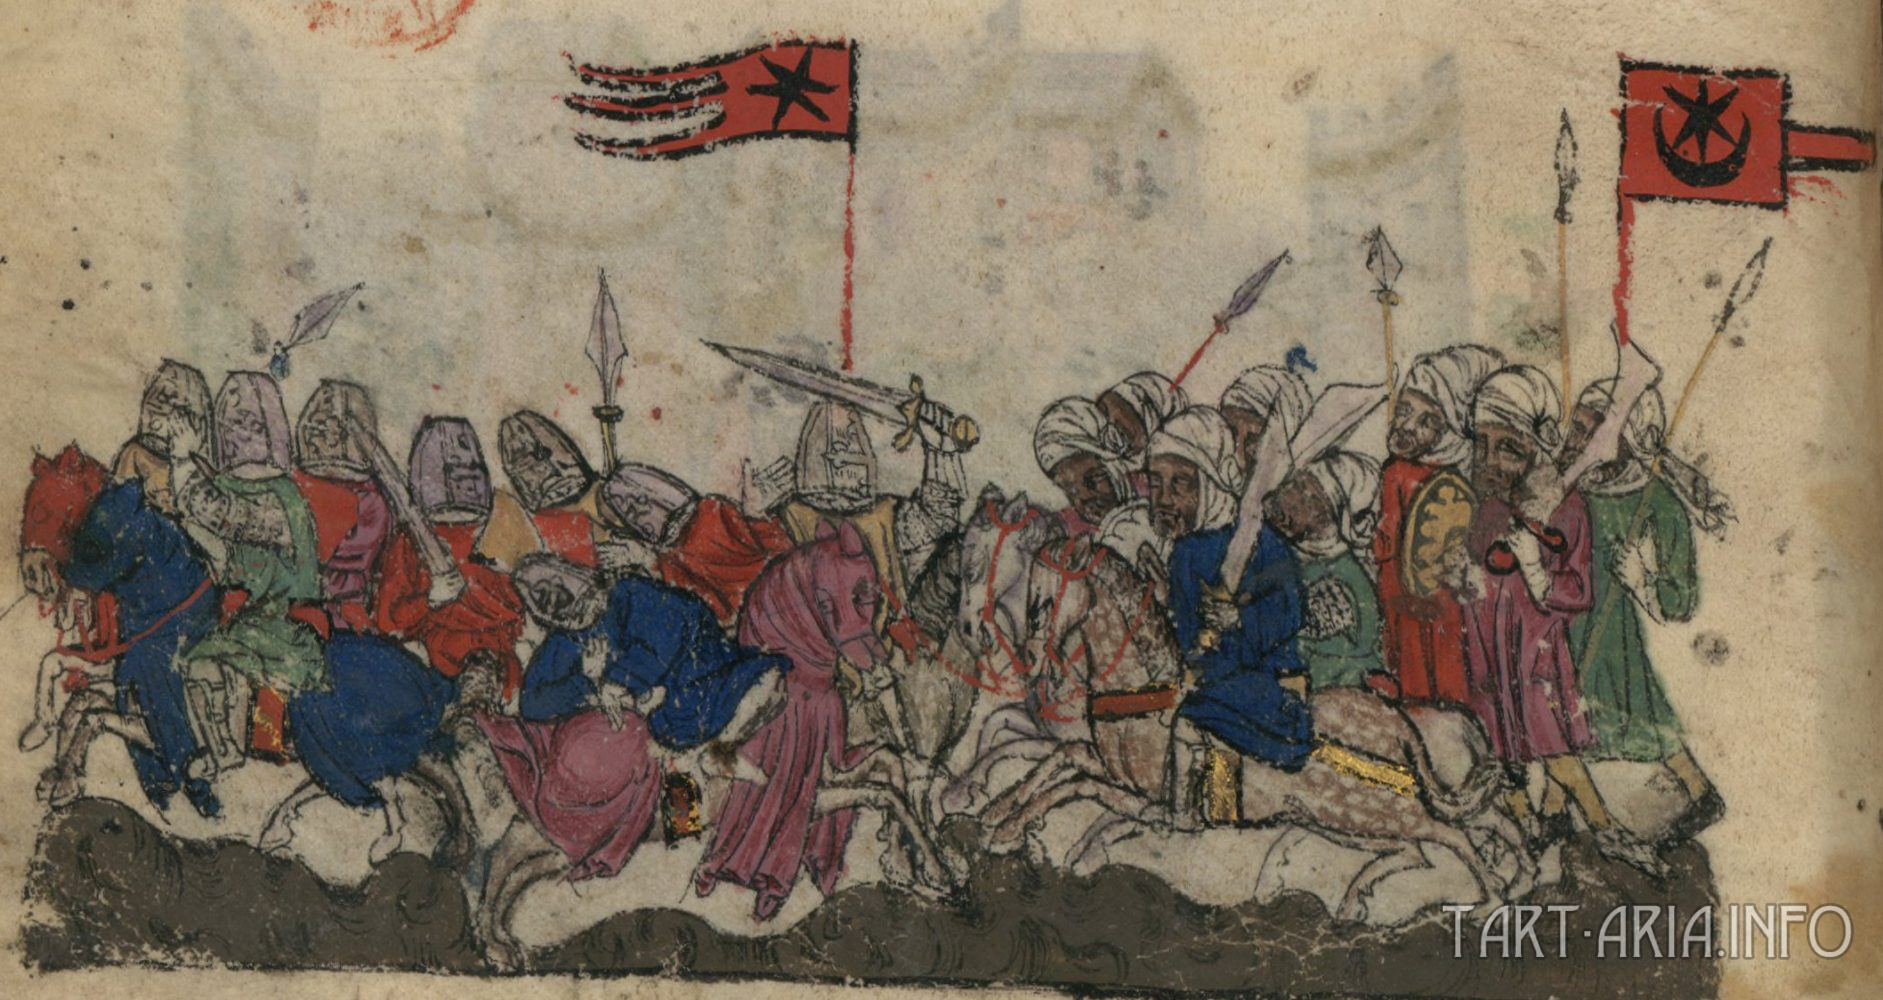 Битва при Ярмуке между Византией и Арабским исламским халифатом в 636 году.